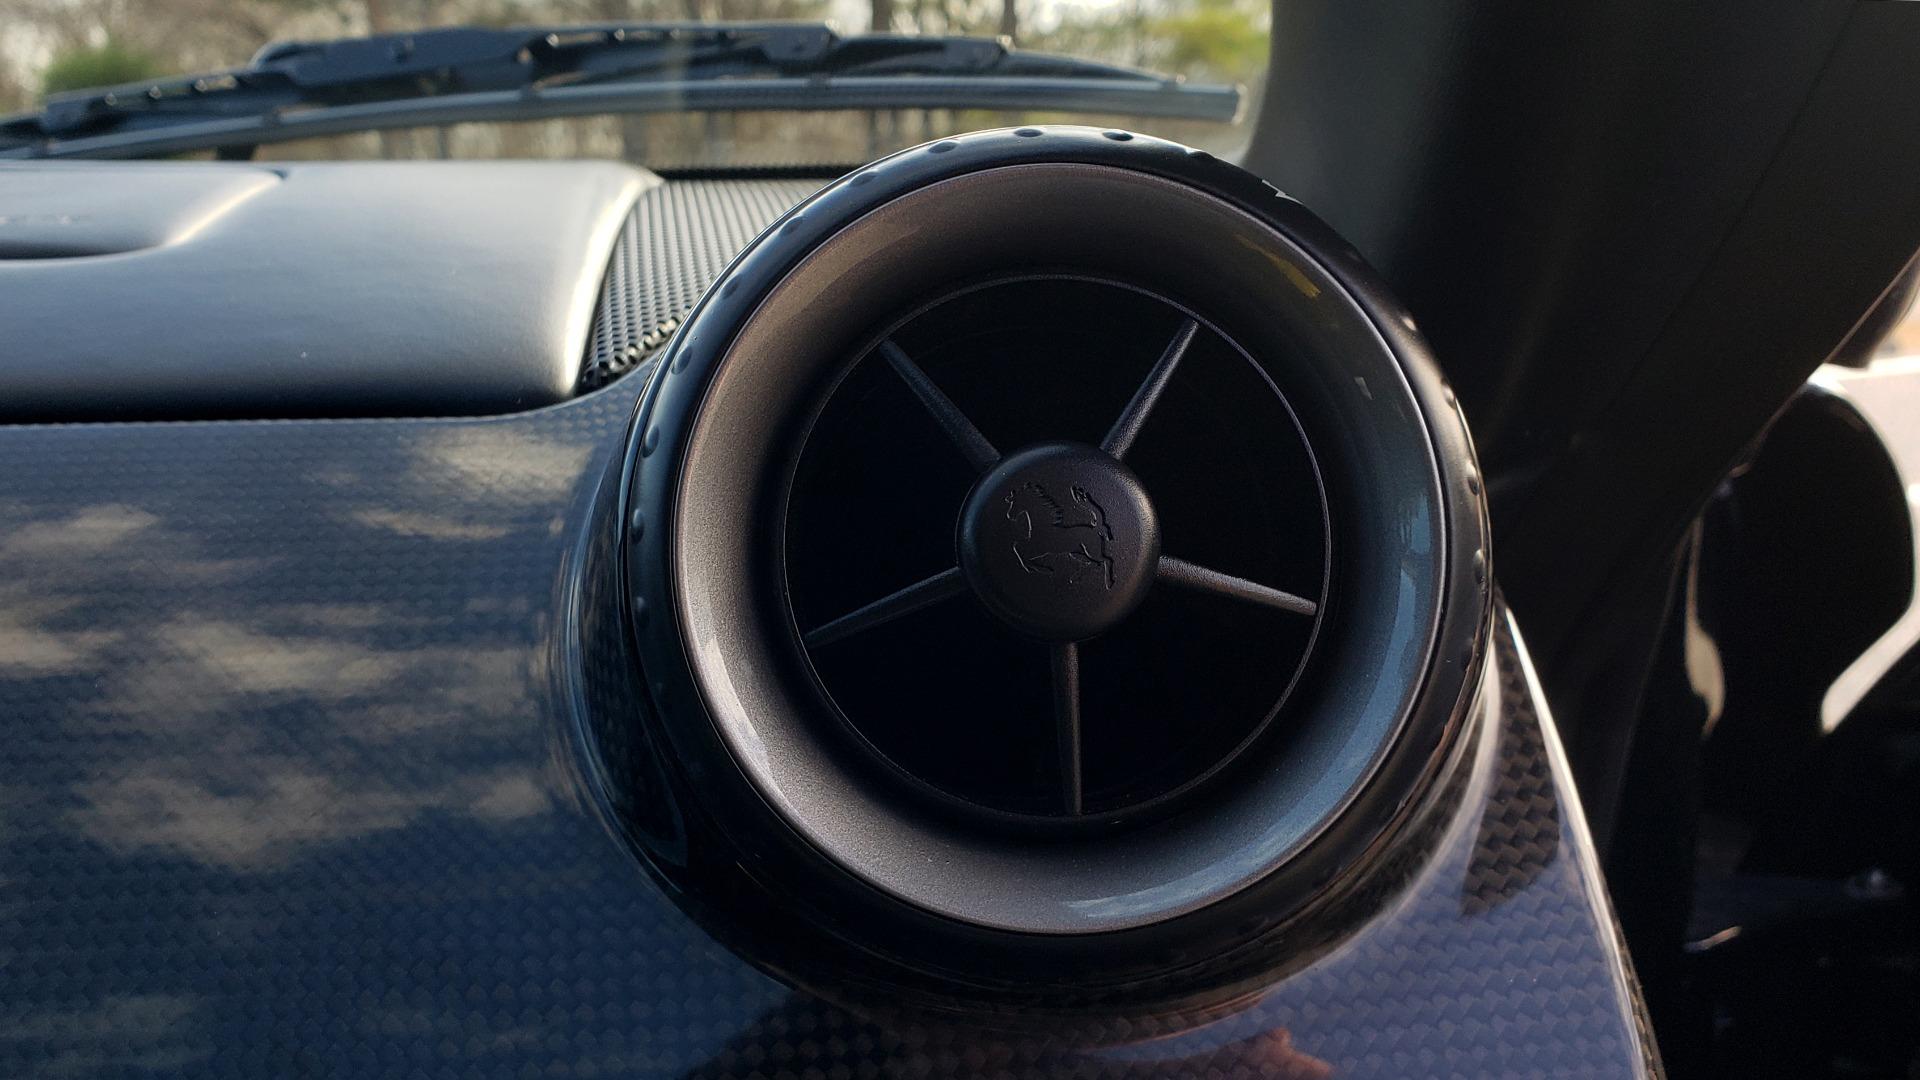 Used 2007 Ferrari 599 GTB FIORANO HGTE / V12 / F1 TRANS / NAV / BOSE / CUSTOM WHEELS for sale $109,999 at Formula Imports in Charlotte NC 28227 104